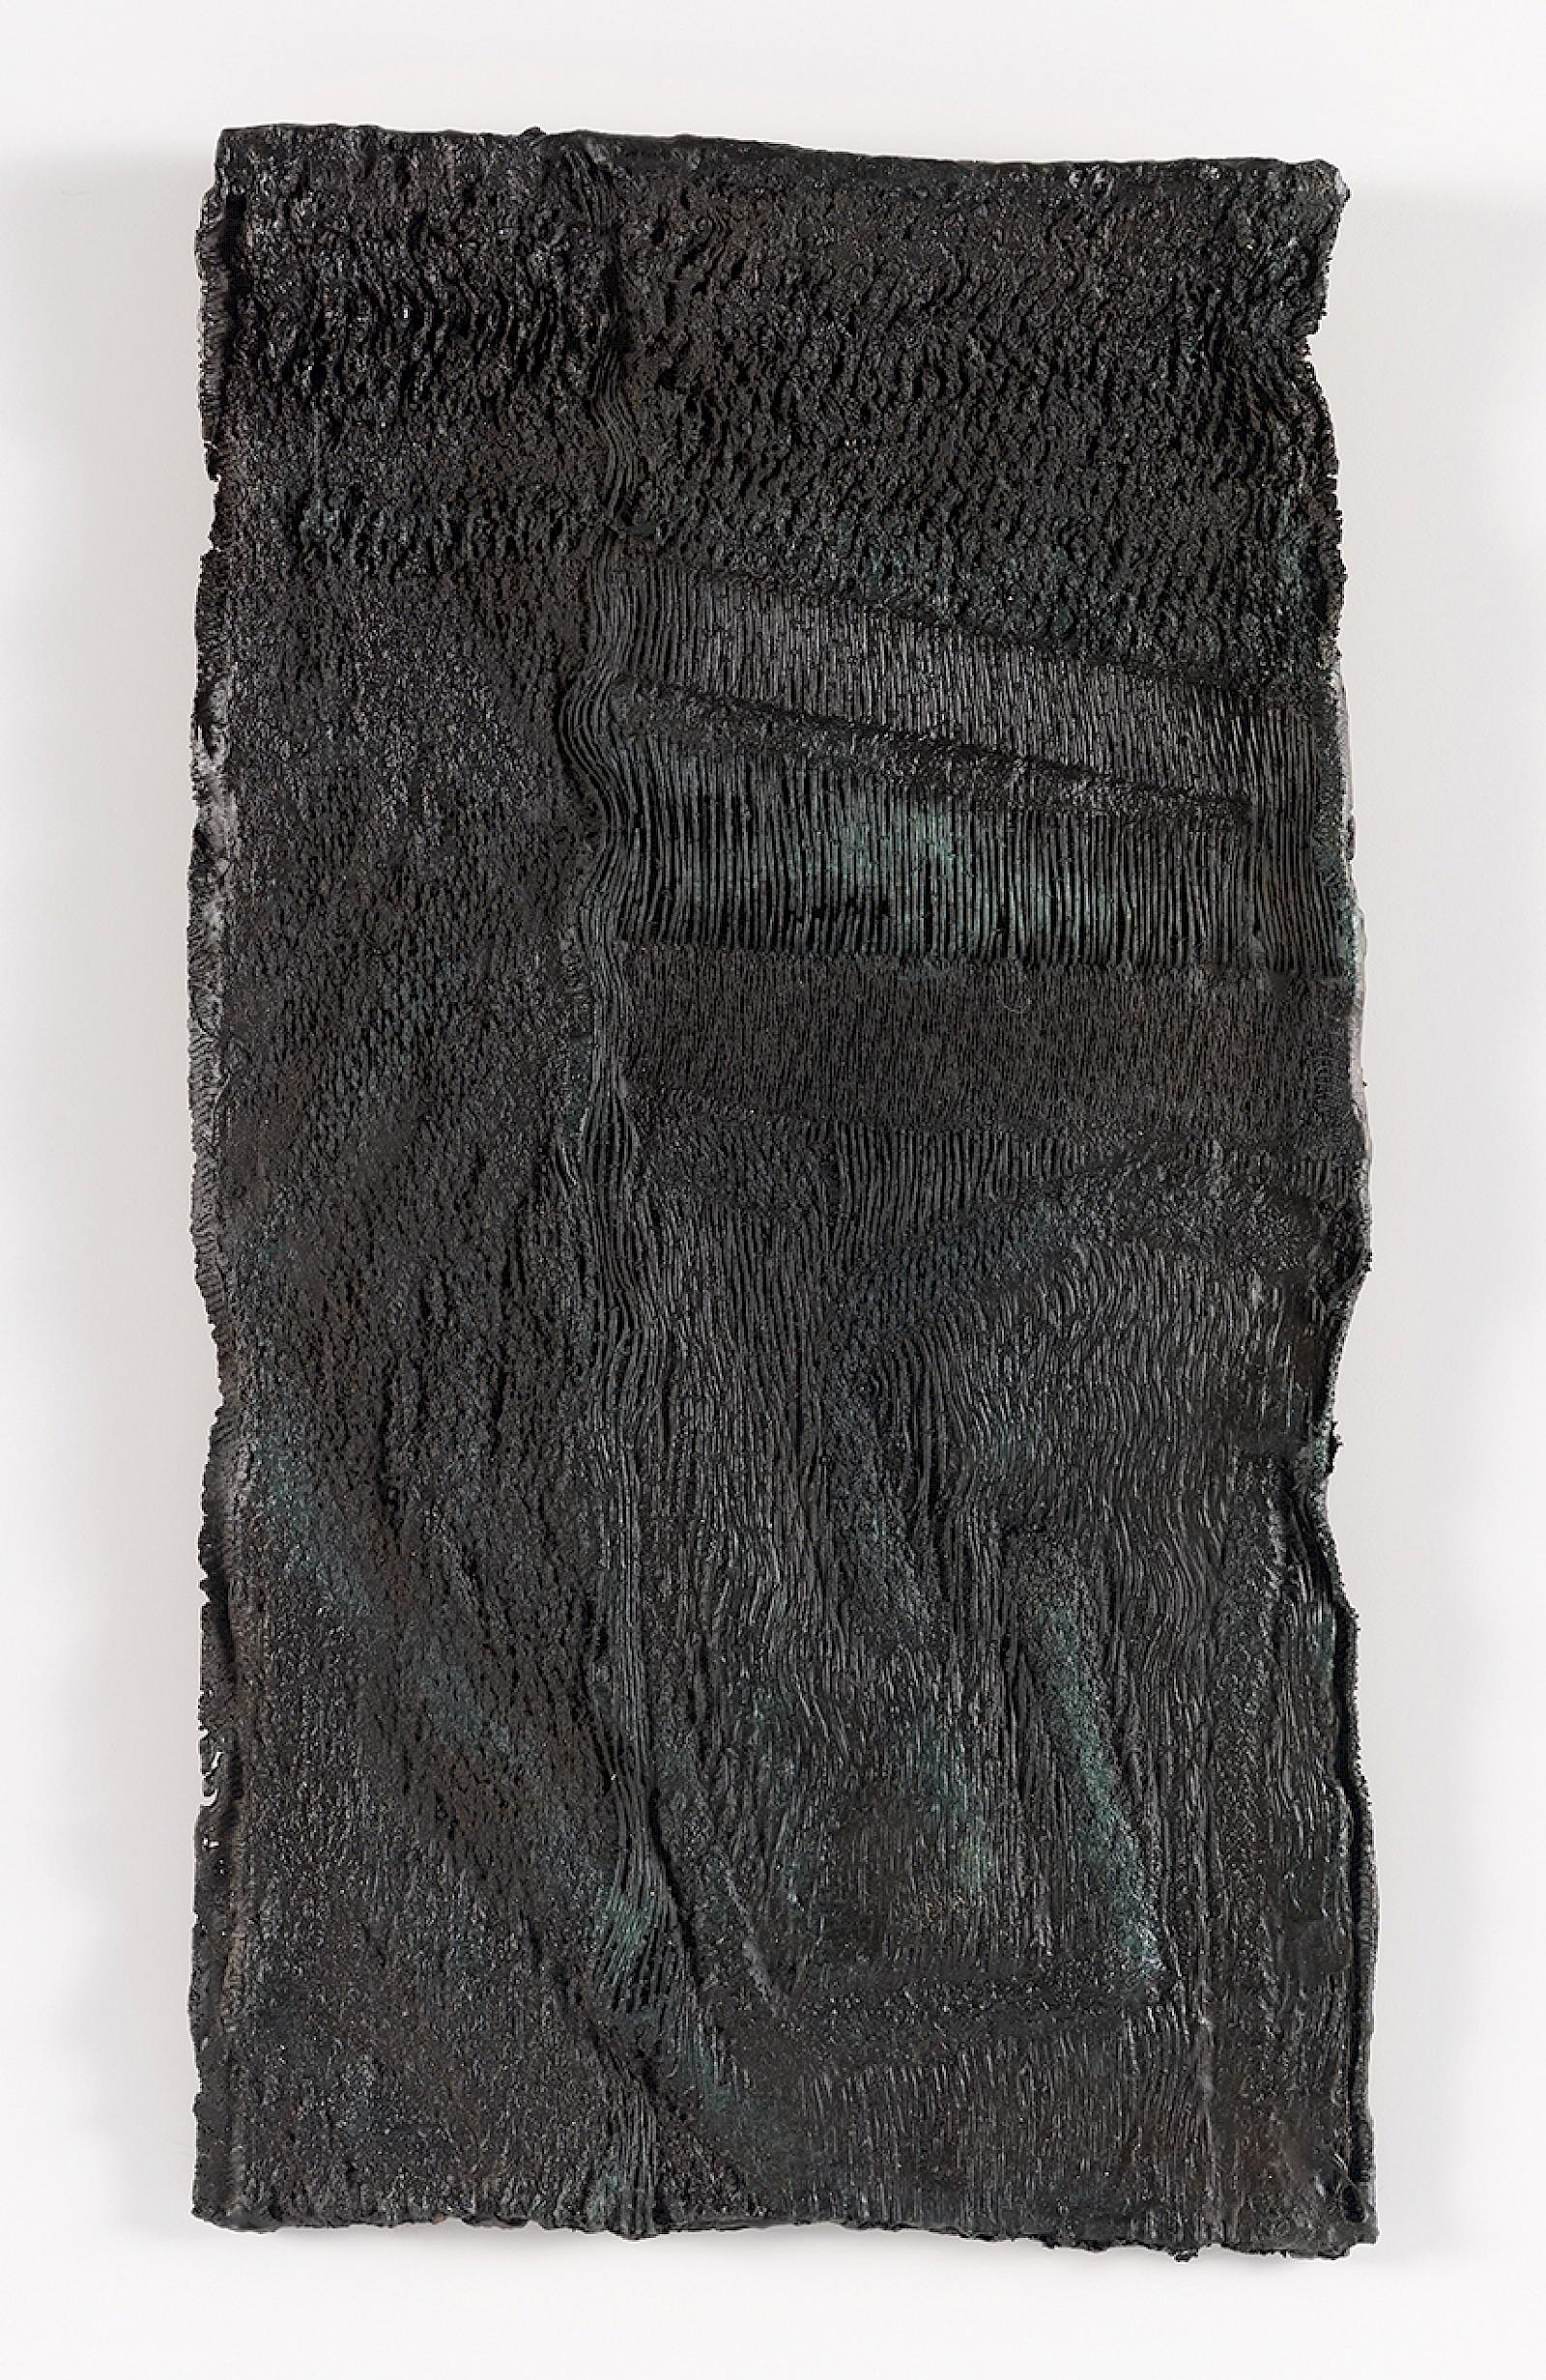 Image - Bronzamic, Bronze, Size: 21 x 37 x 0.5cm